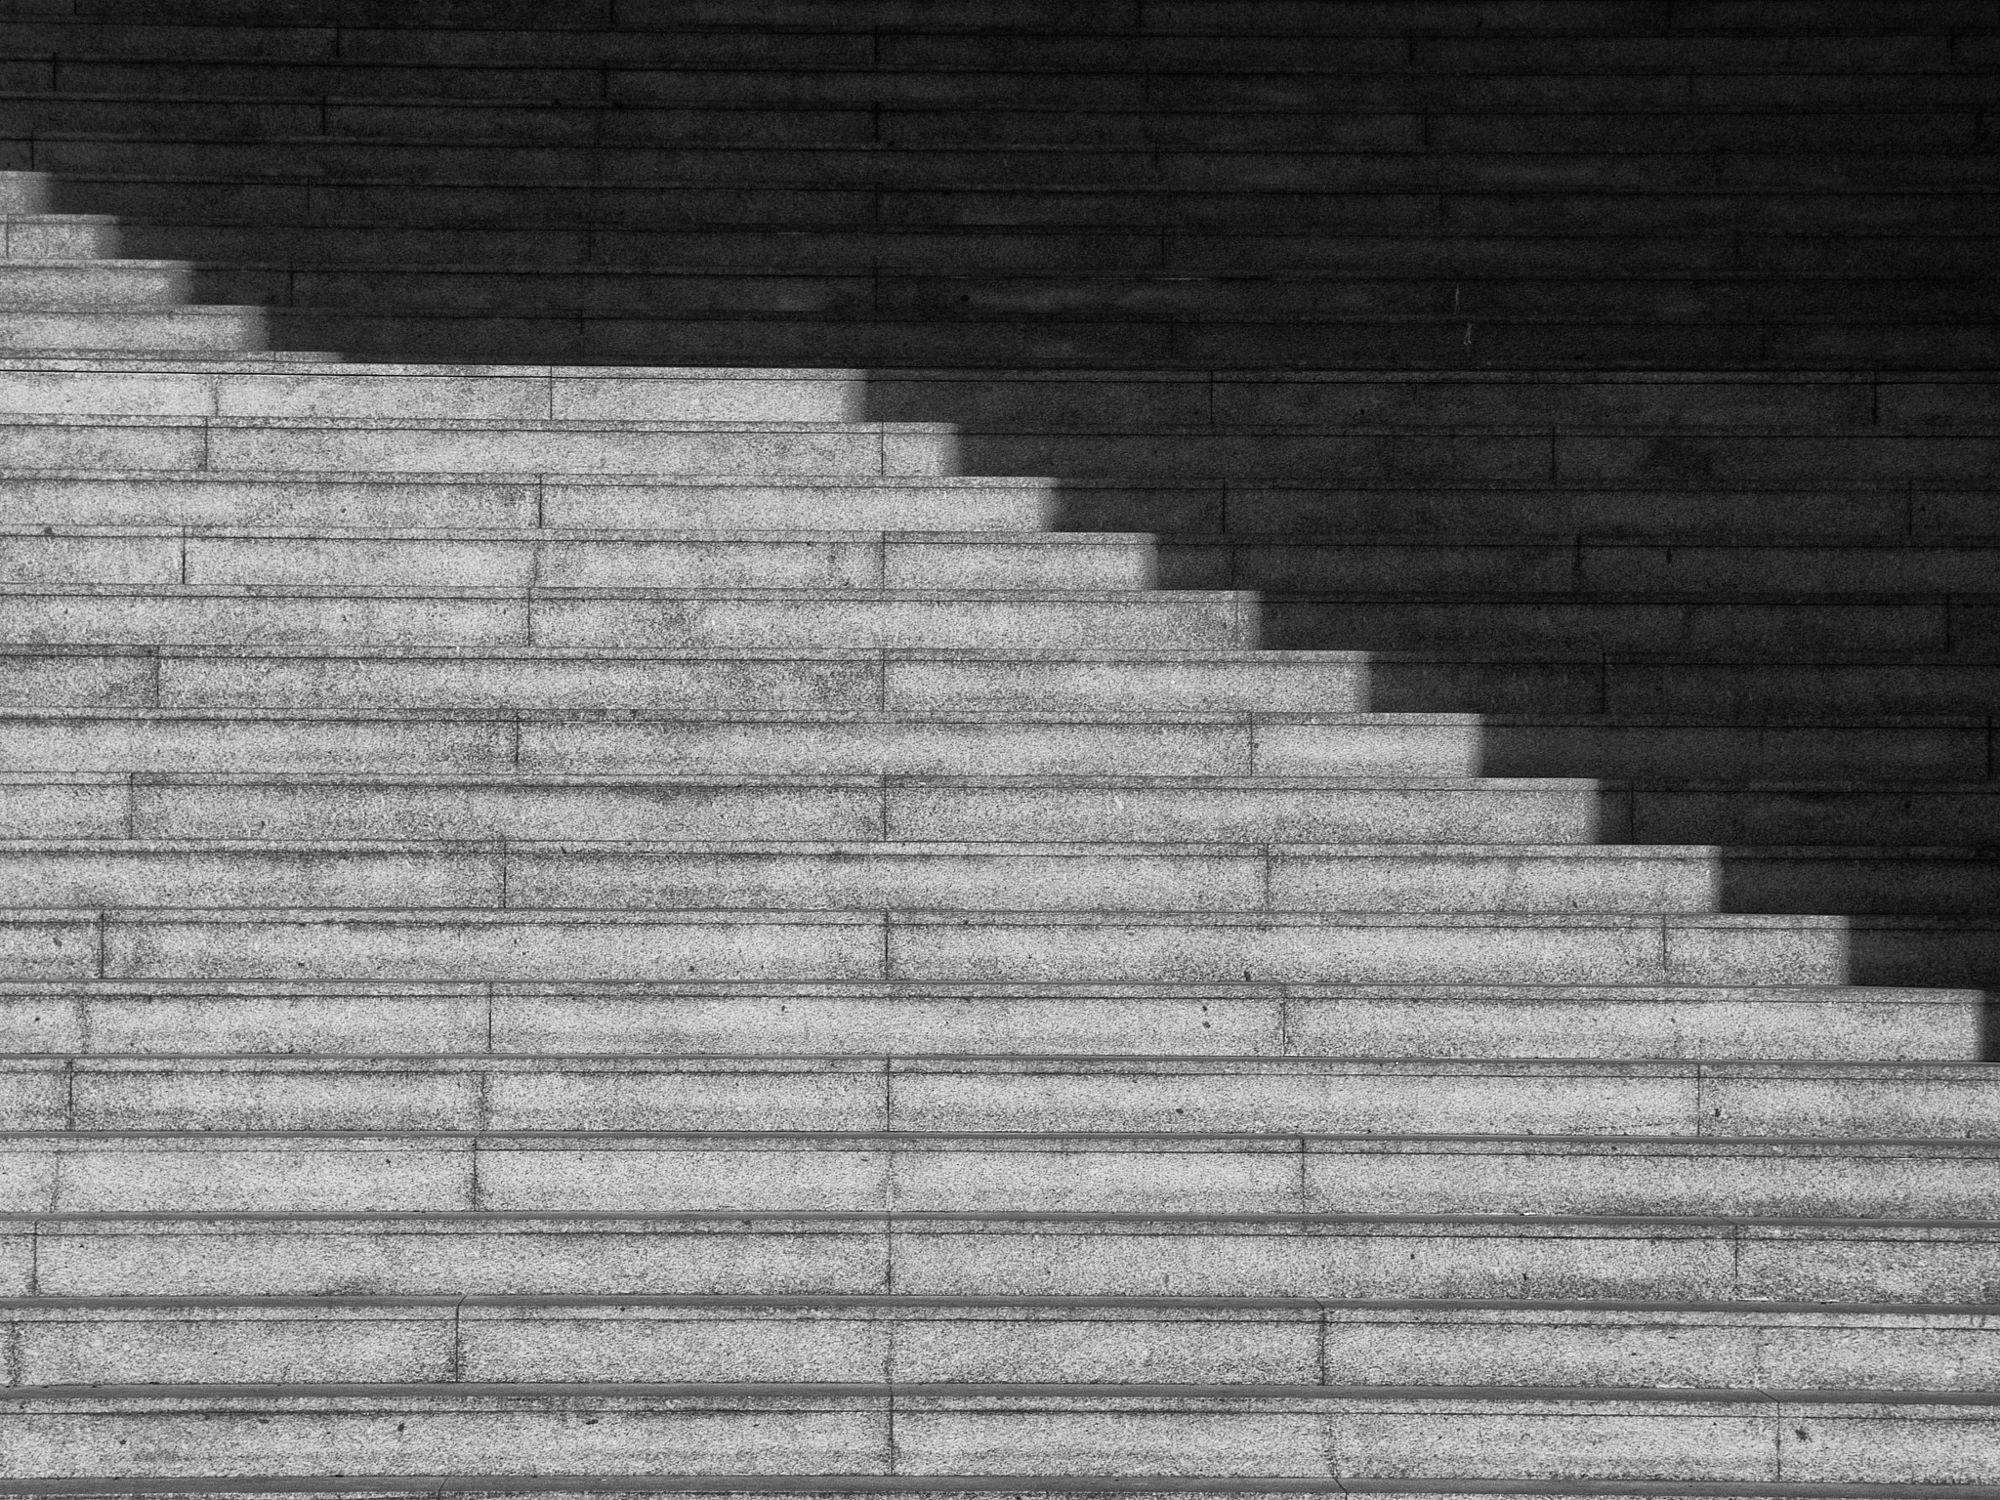 Free Image: Concrete stairs | Libreshot Public Domain Photos